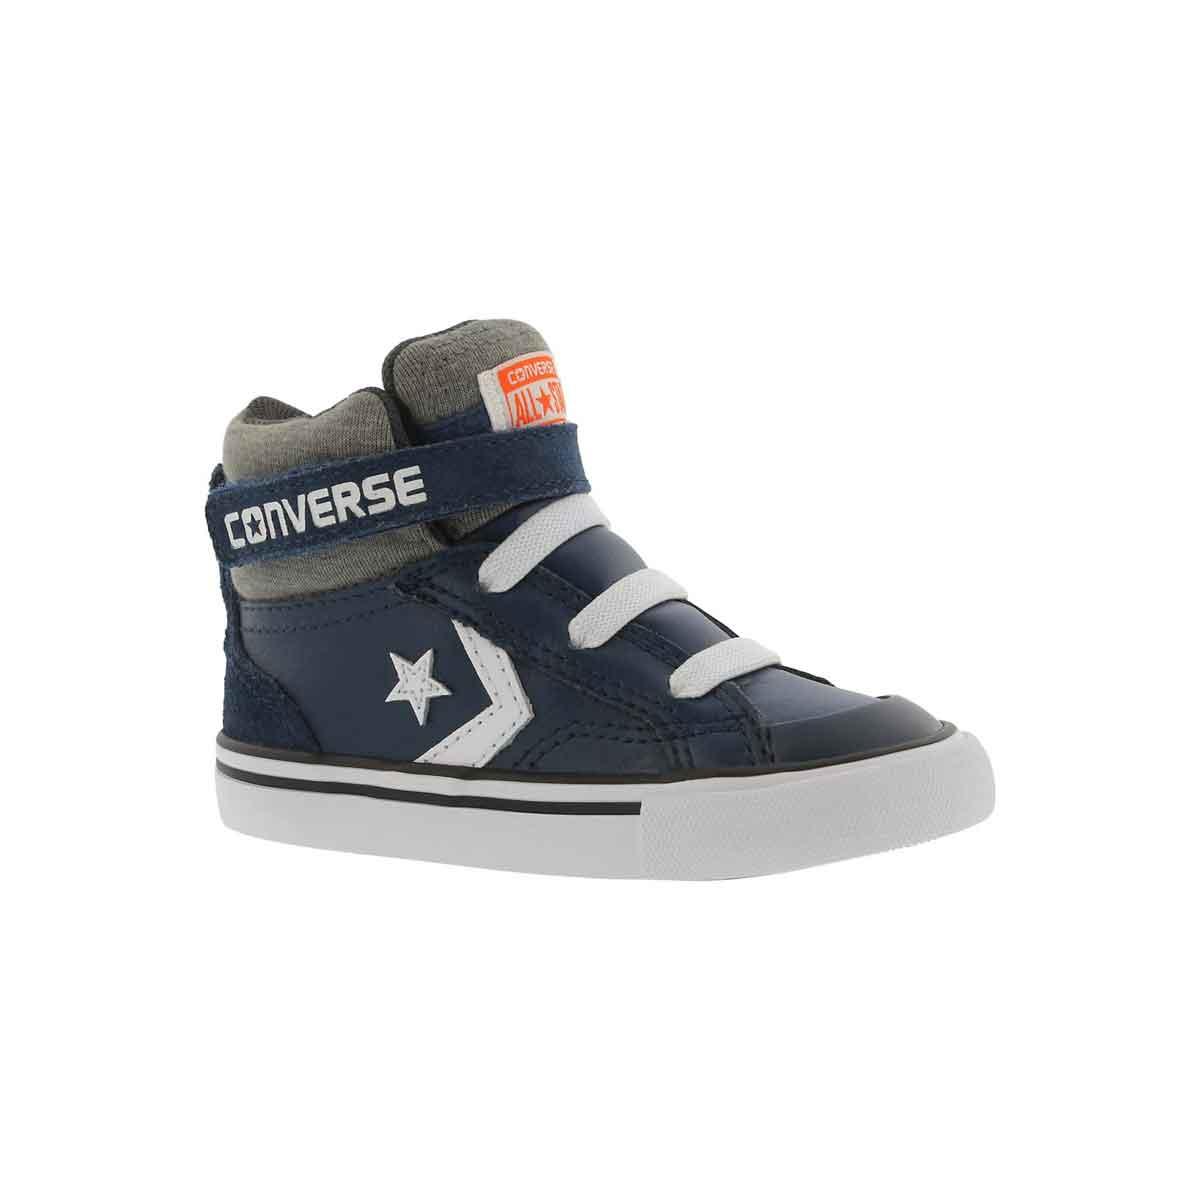 Inf-b Pro Blaze Hi navy/storm sneaker